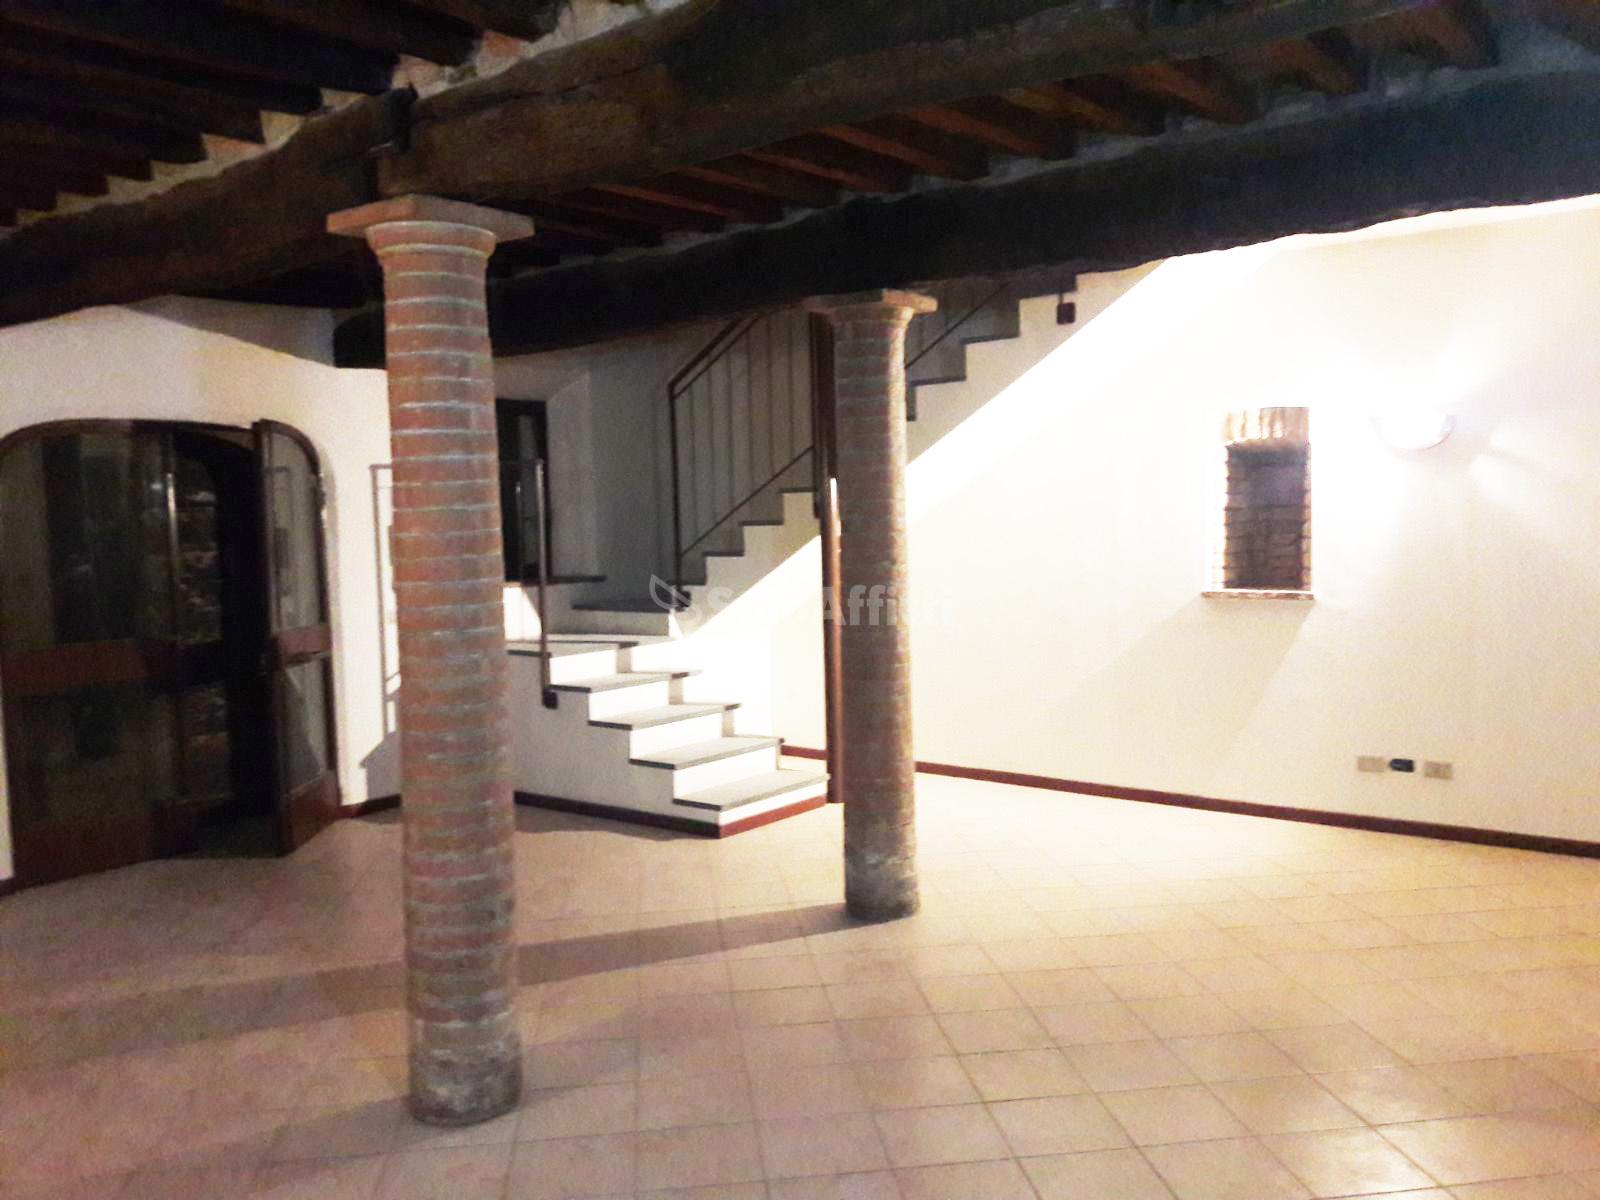 SoloAffittiParma1,tre camere e giardino a San Polo